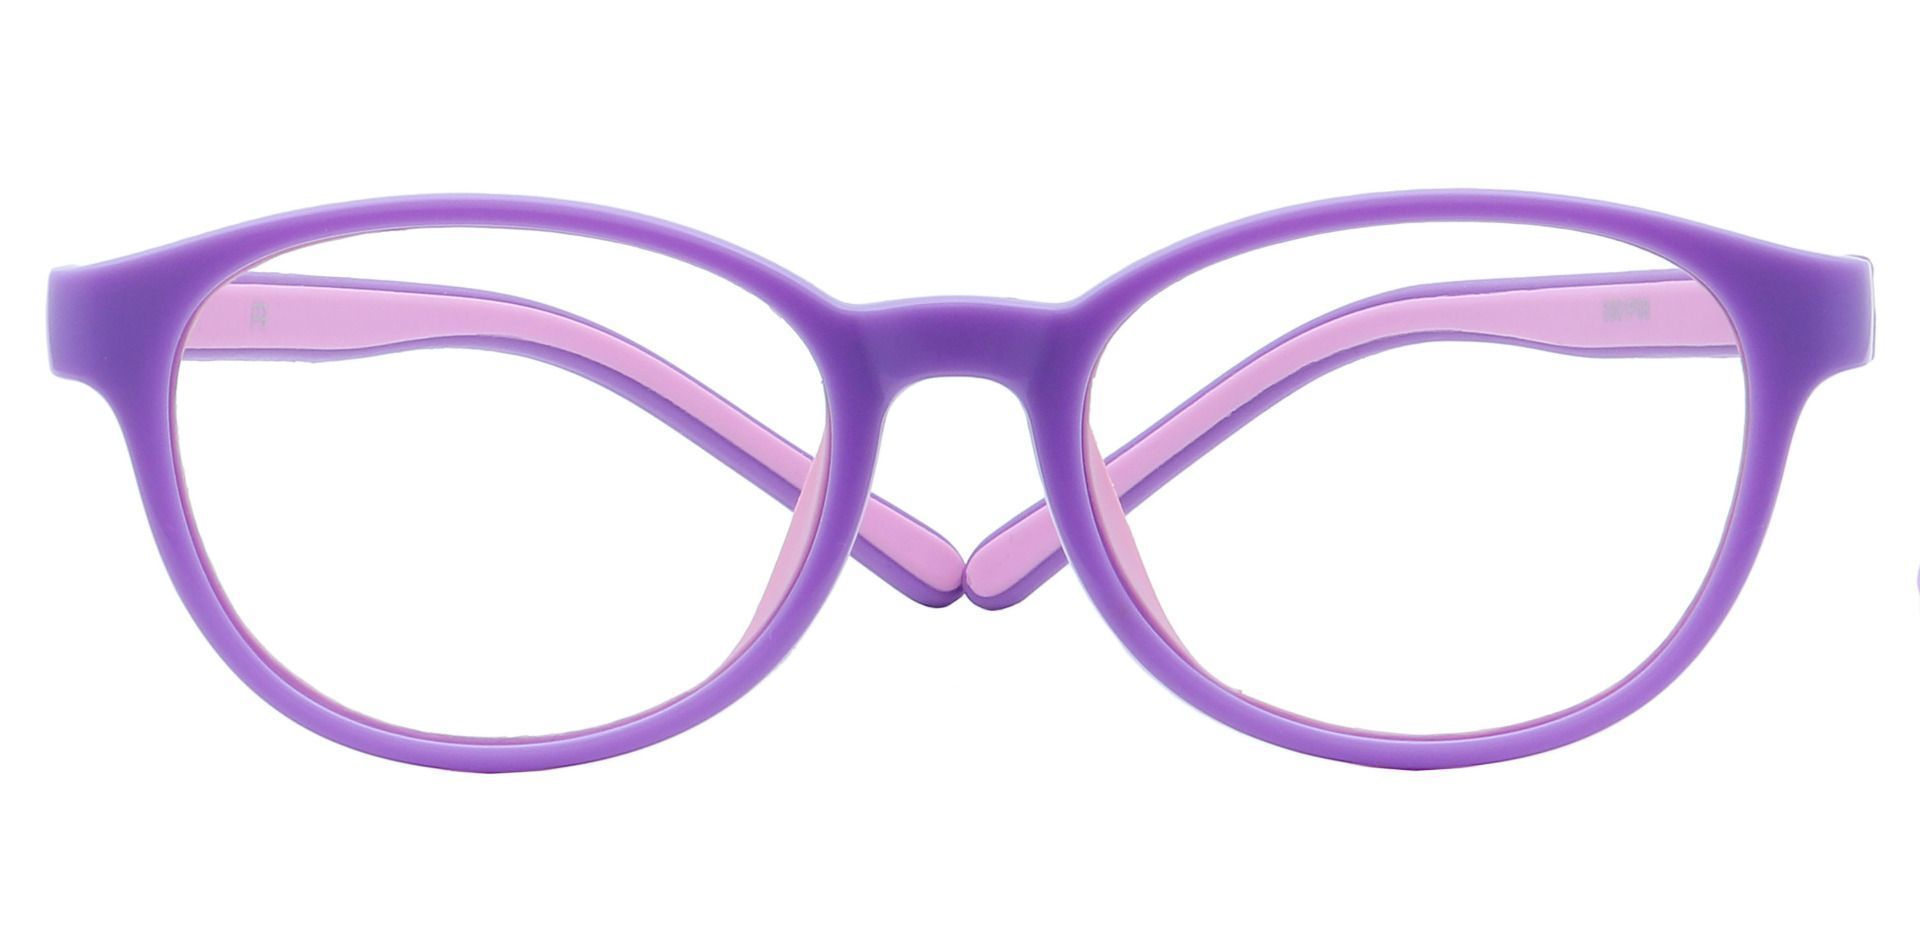 Pace Round Blue Light Blocking Glasses - Purple